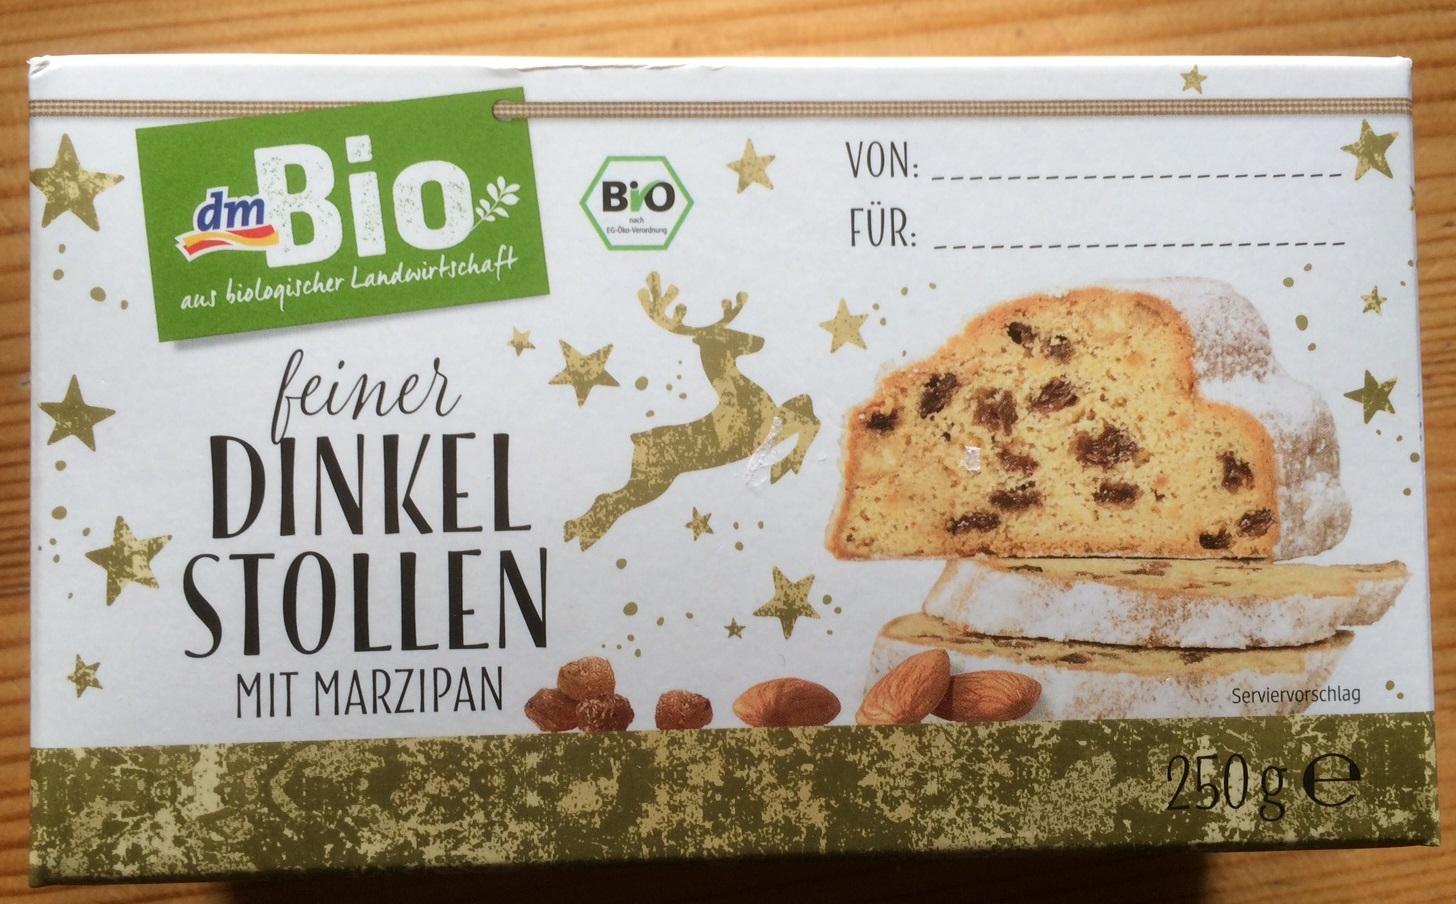 [Lokal Dresden] dm-drogerie markt: Bio Dinkel Stollen mit Marzipan